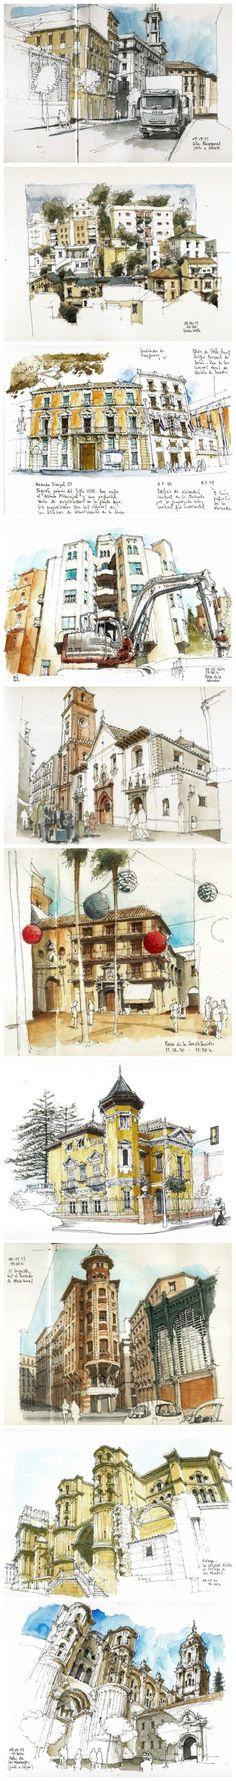 Urban sketches #illustration